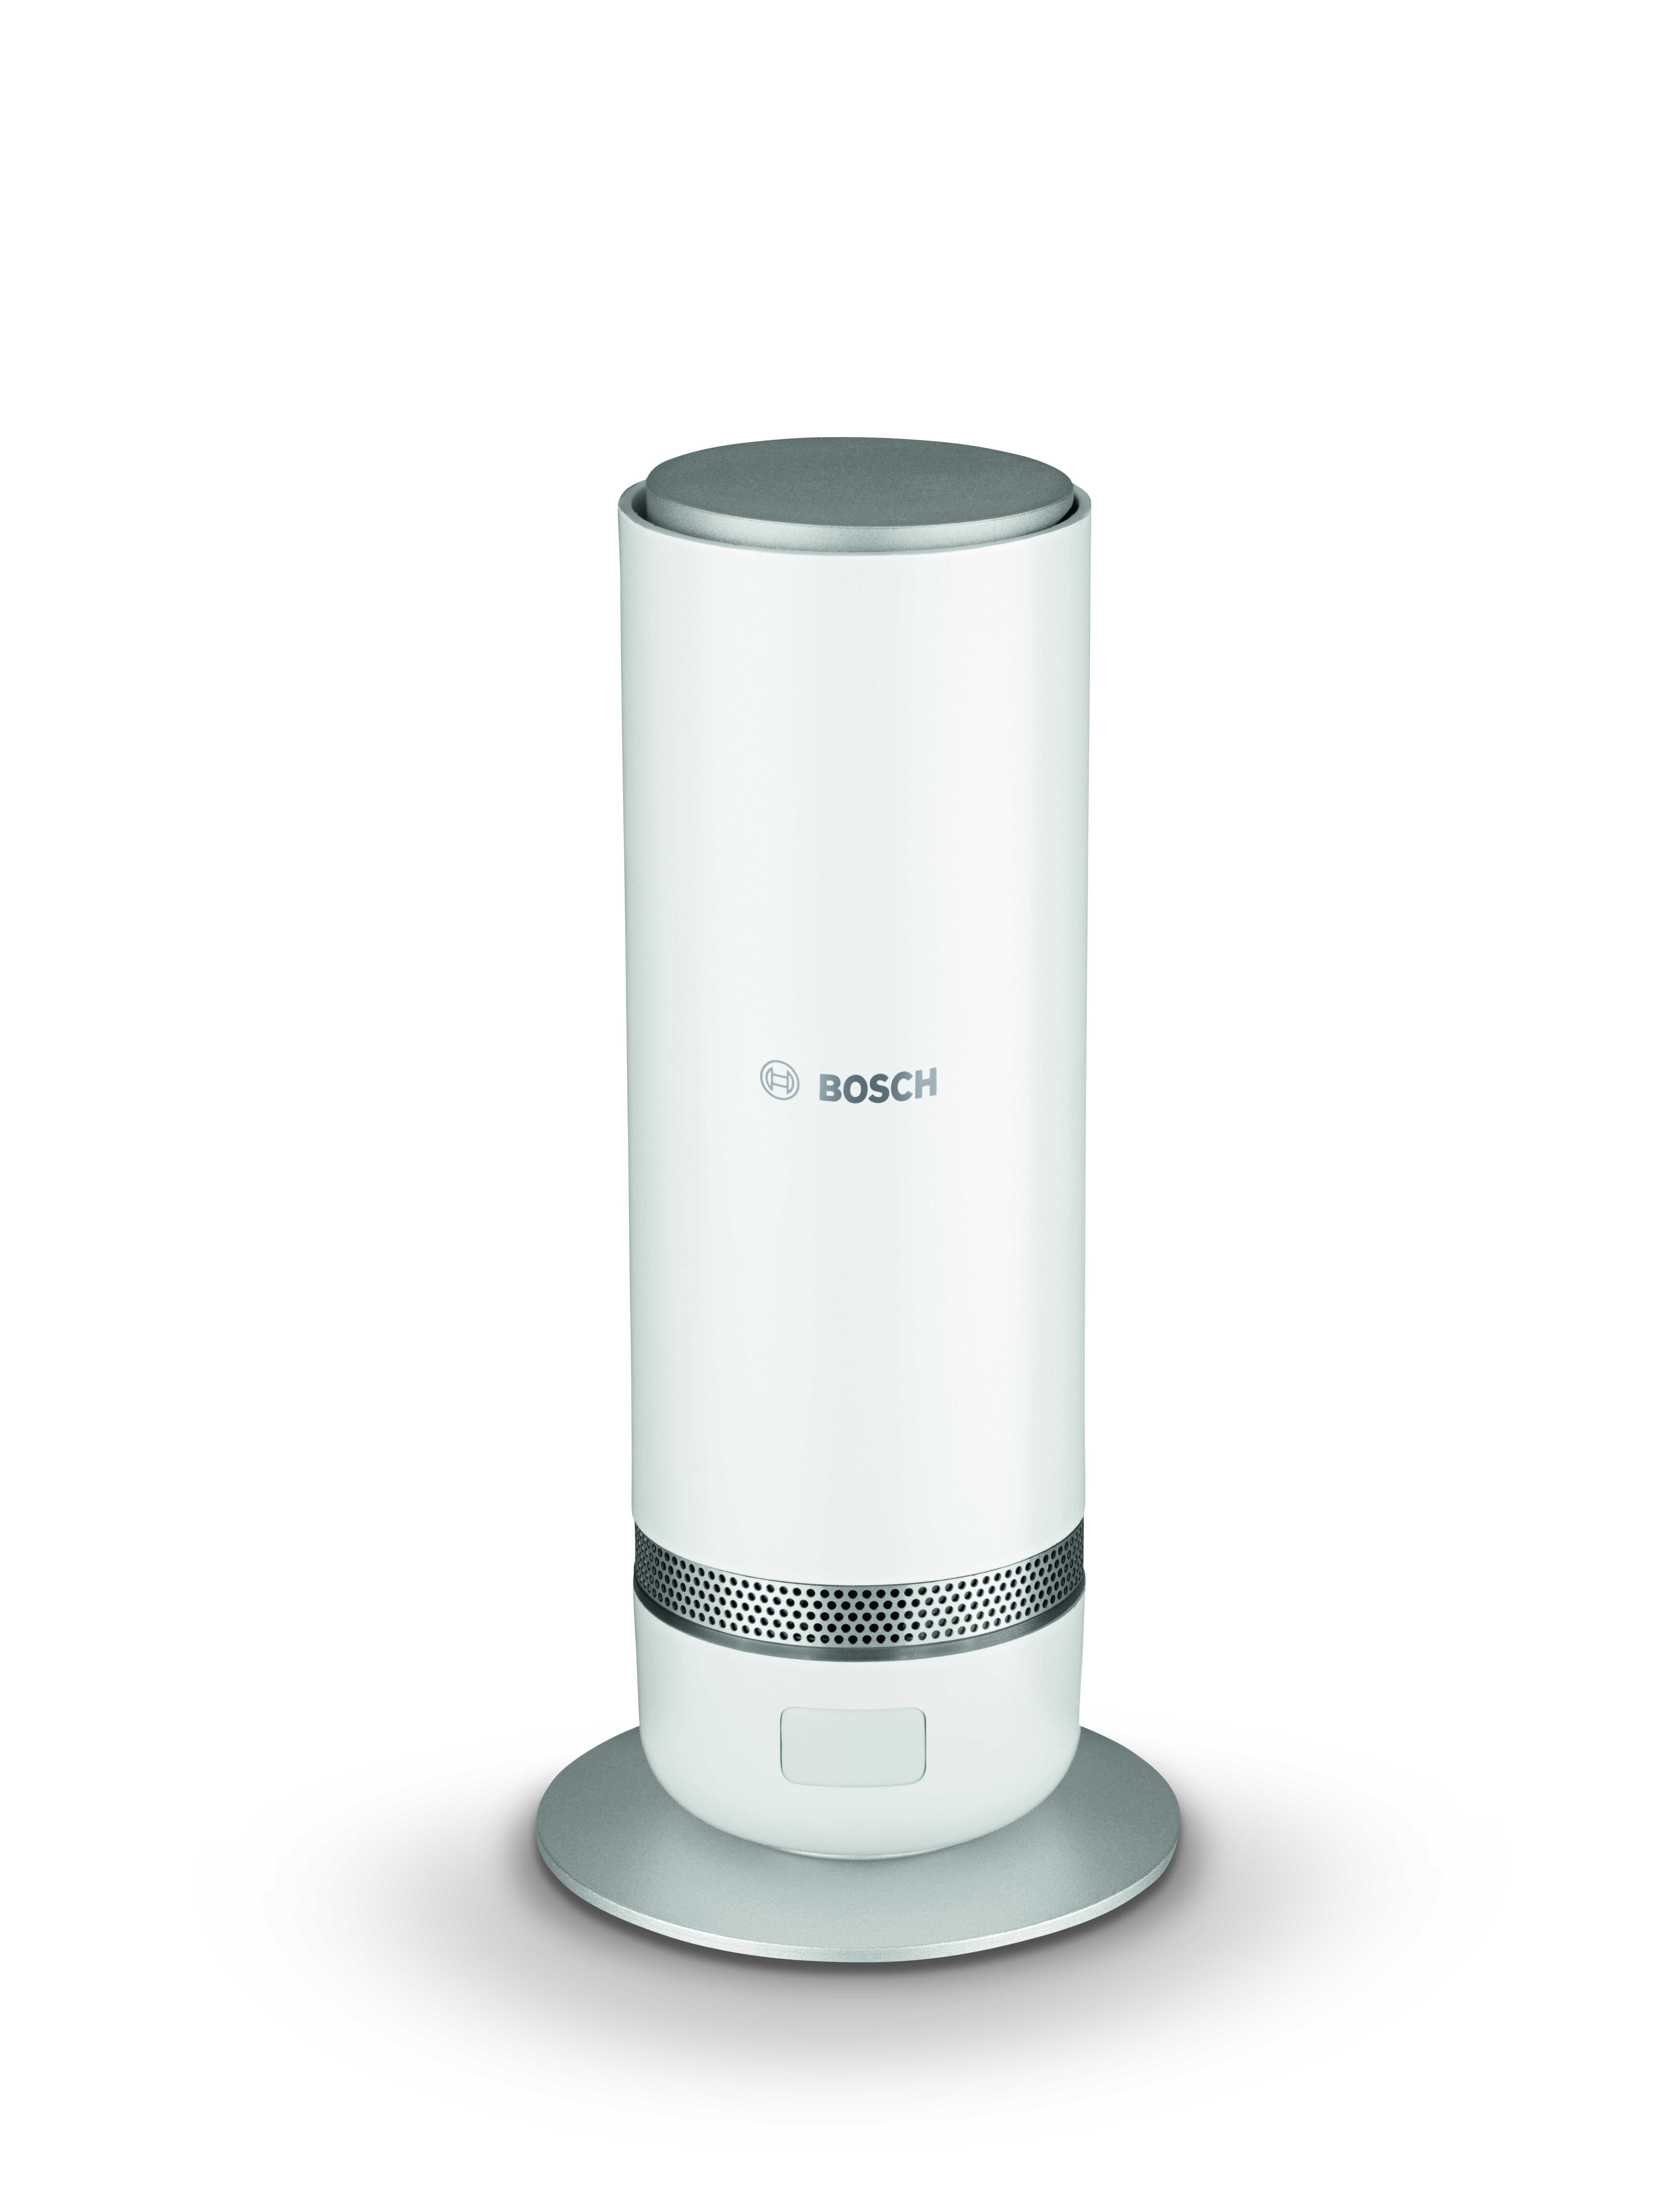 Bosch Smart Home 360° Innenkamera